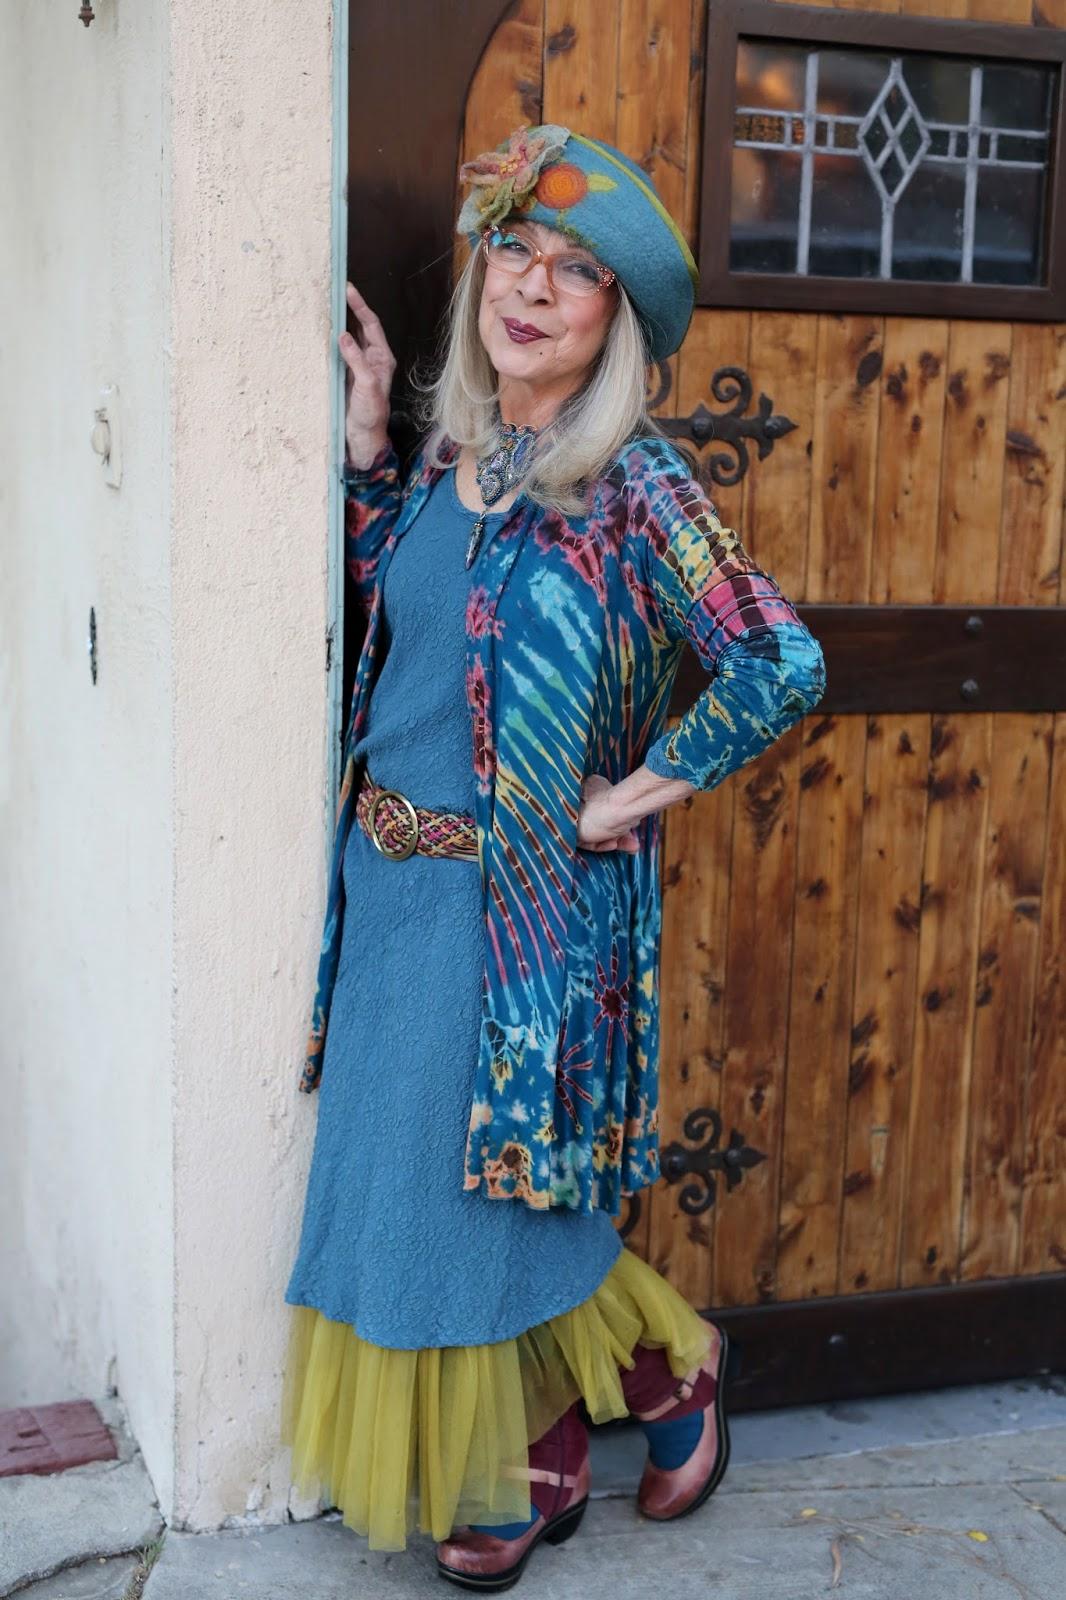 Bohemian Clothing For Older Women Kathleen Advanced Style